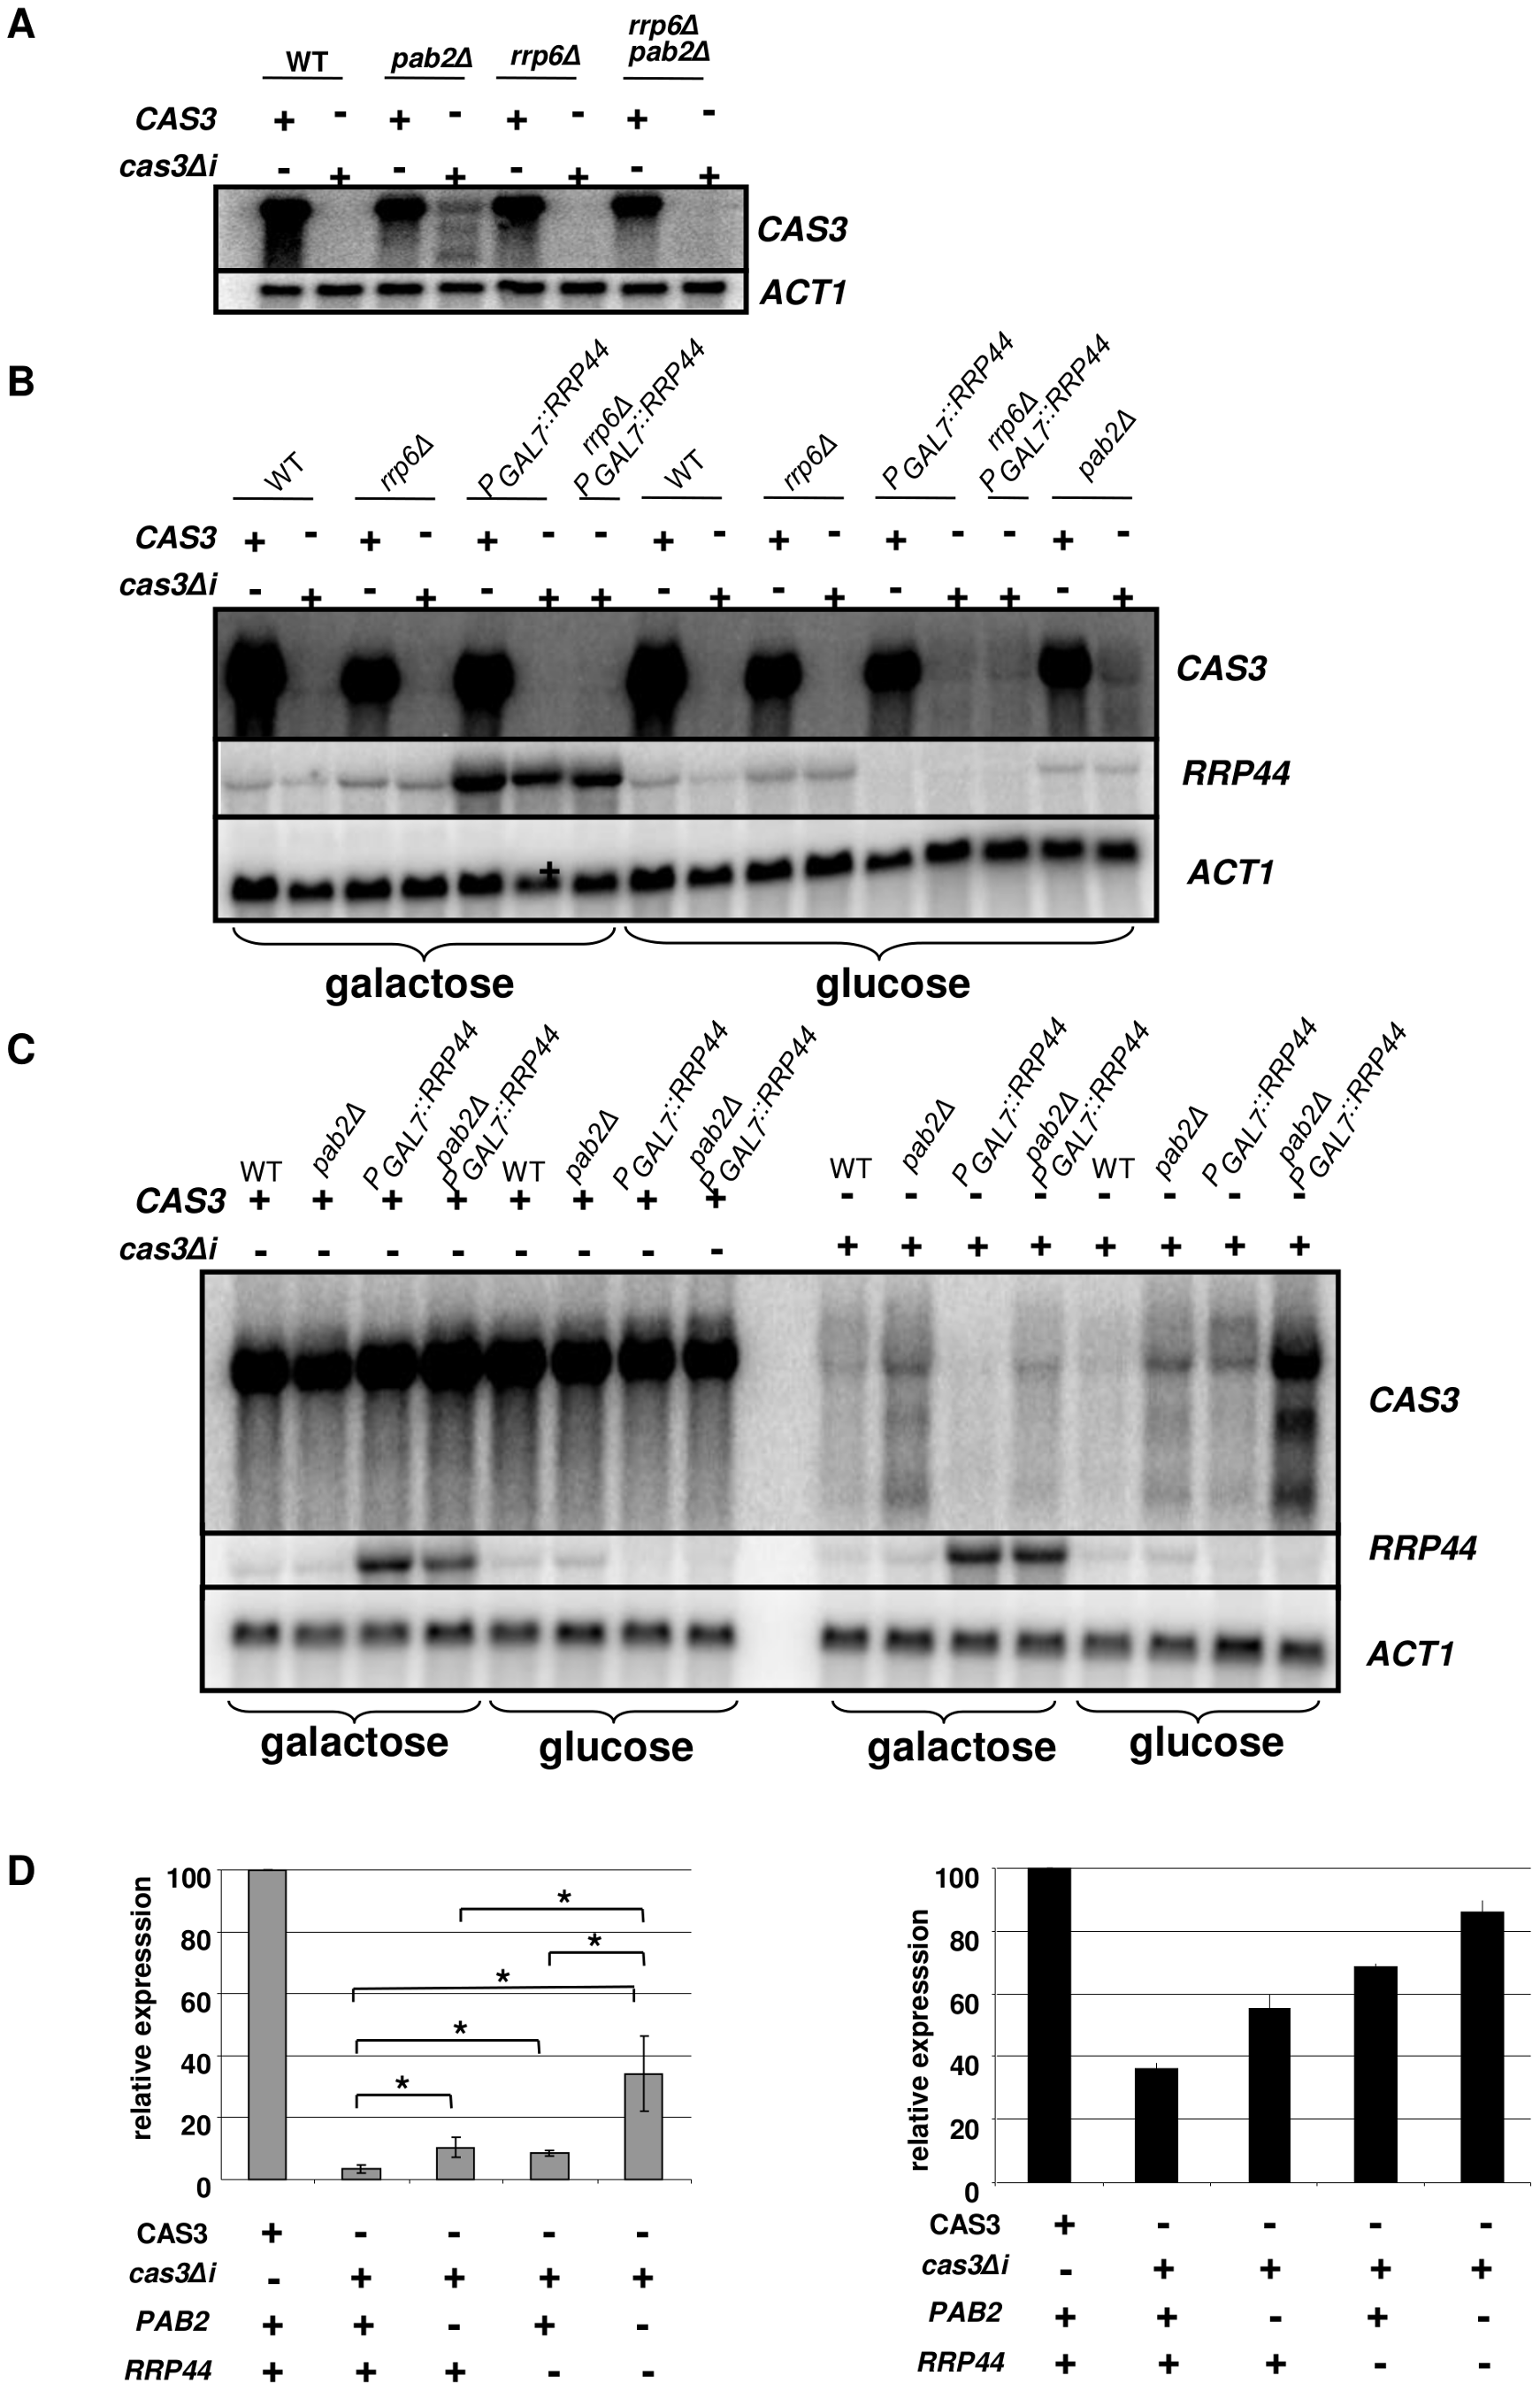 Regulation of <i>cas3Δi</i> mRNA accumulation by the exosome.